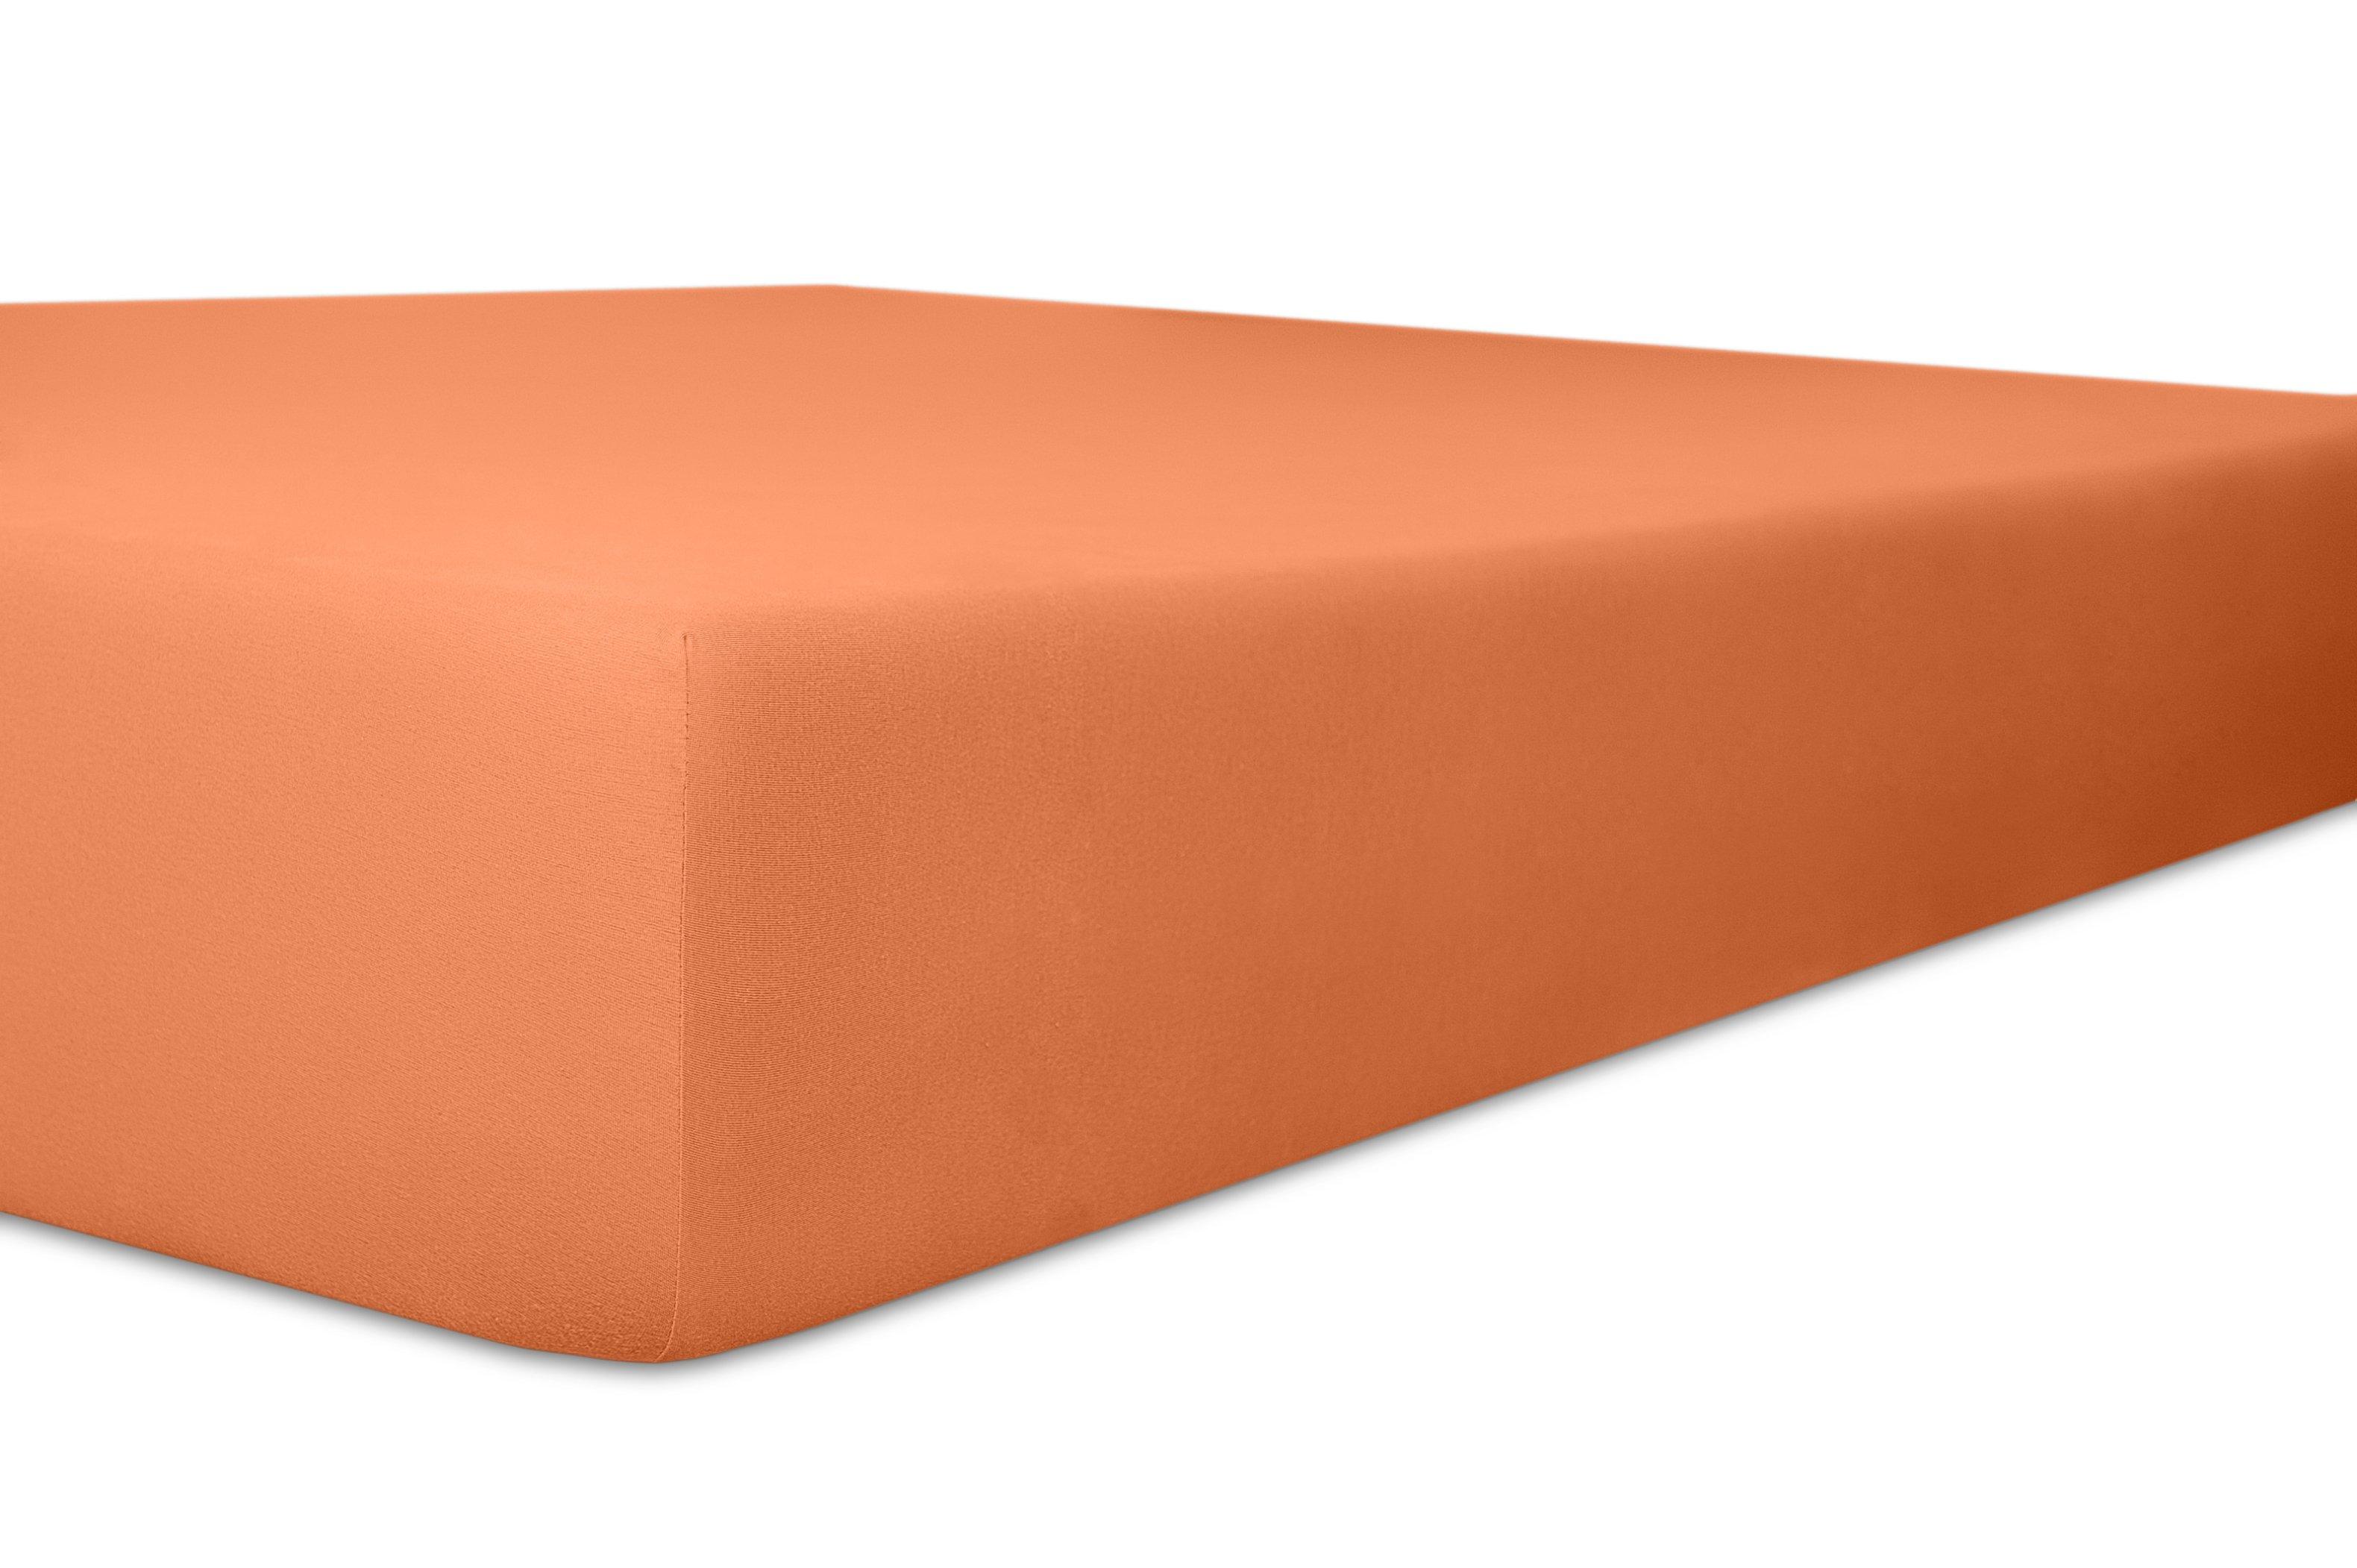 Spannbetttuch karamel,180x200cm